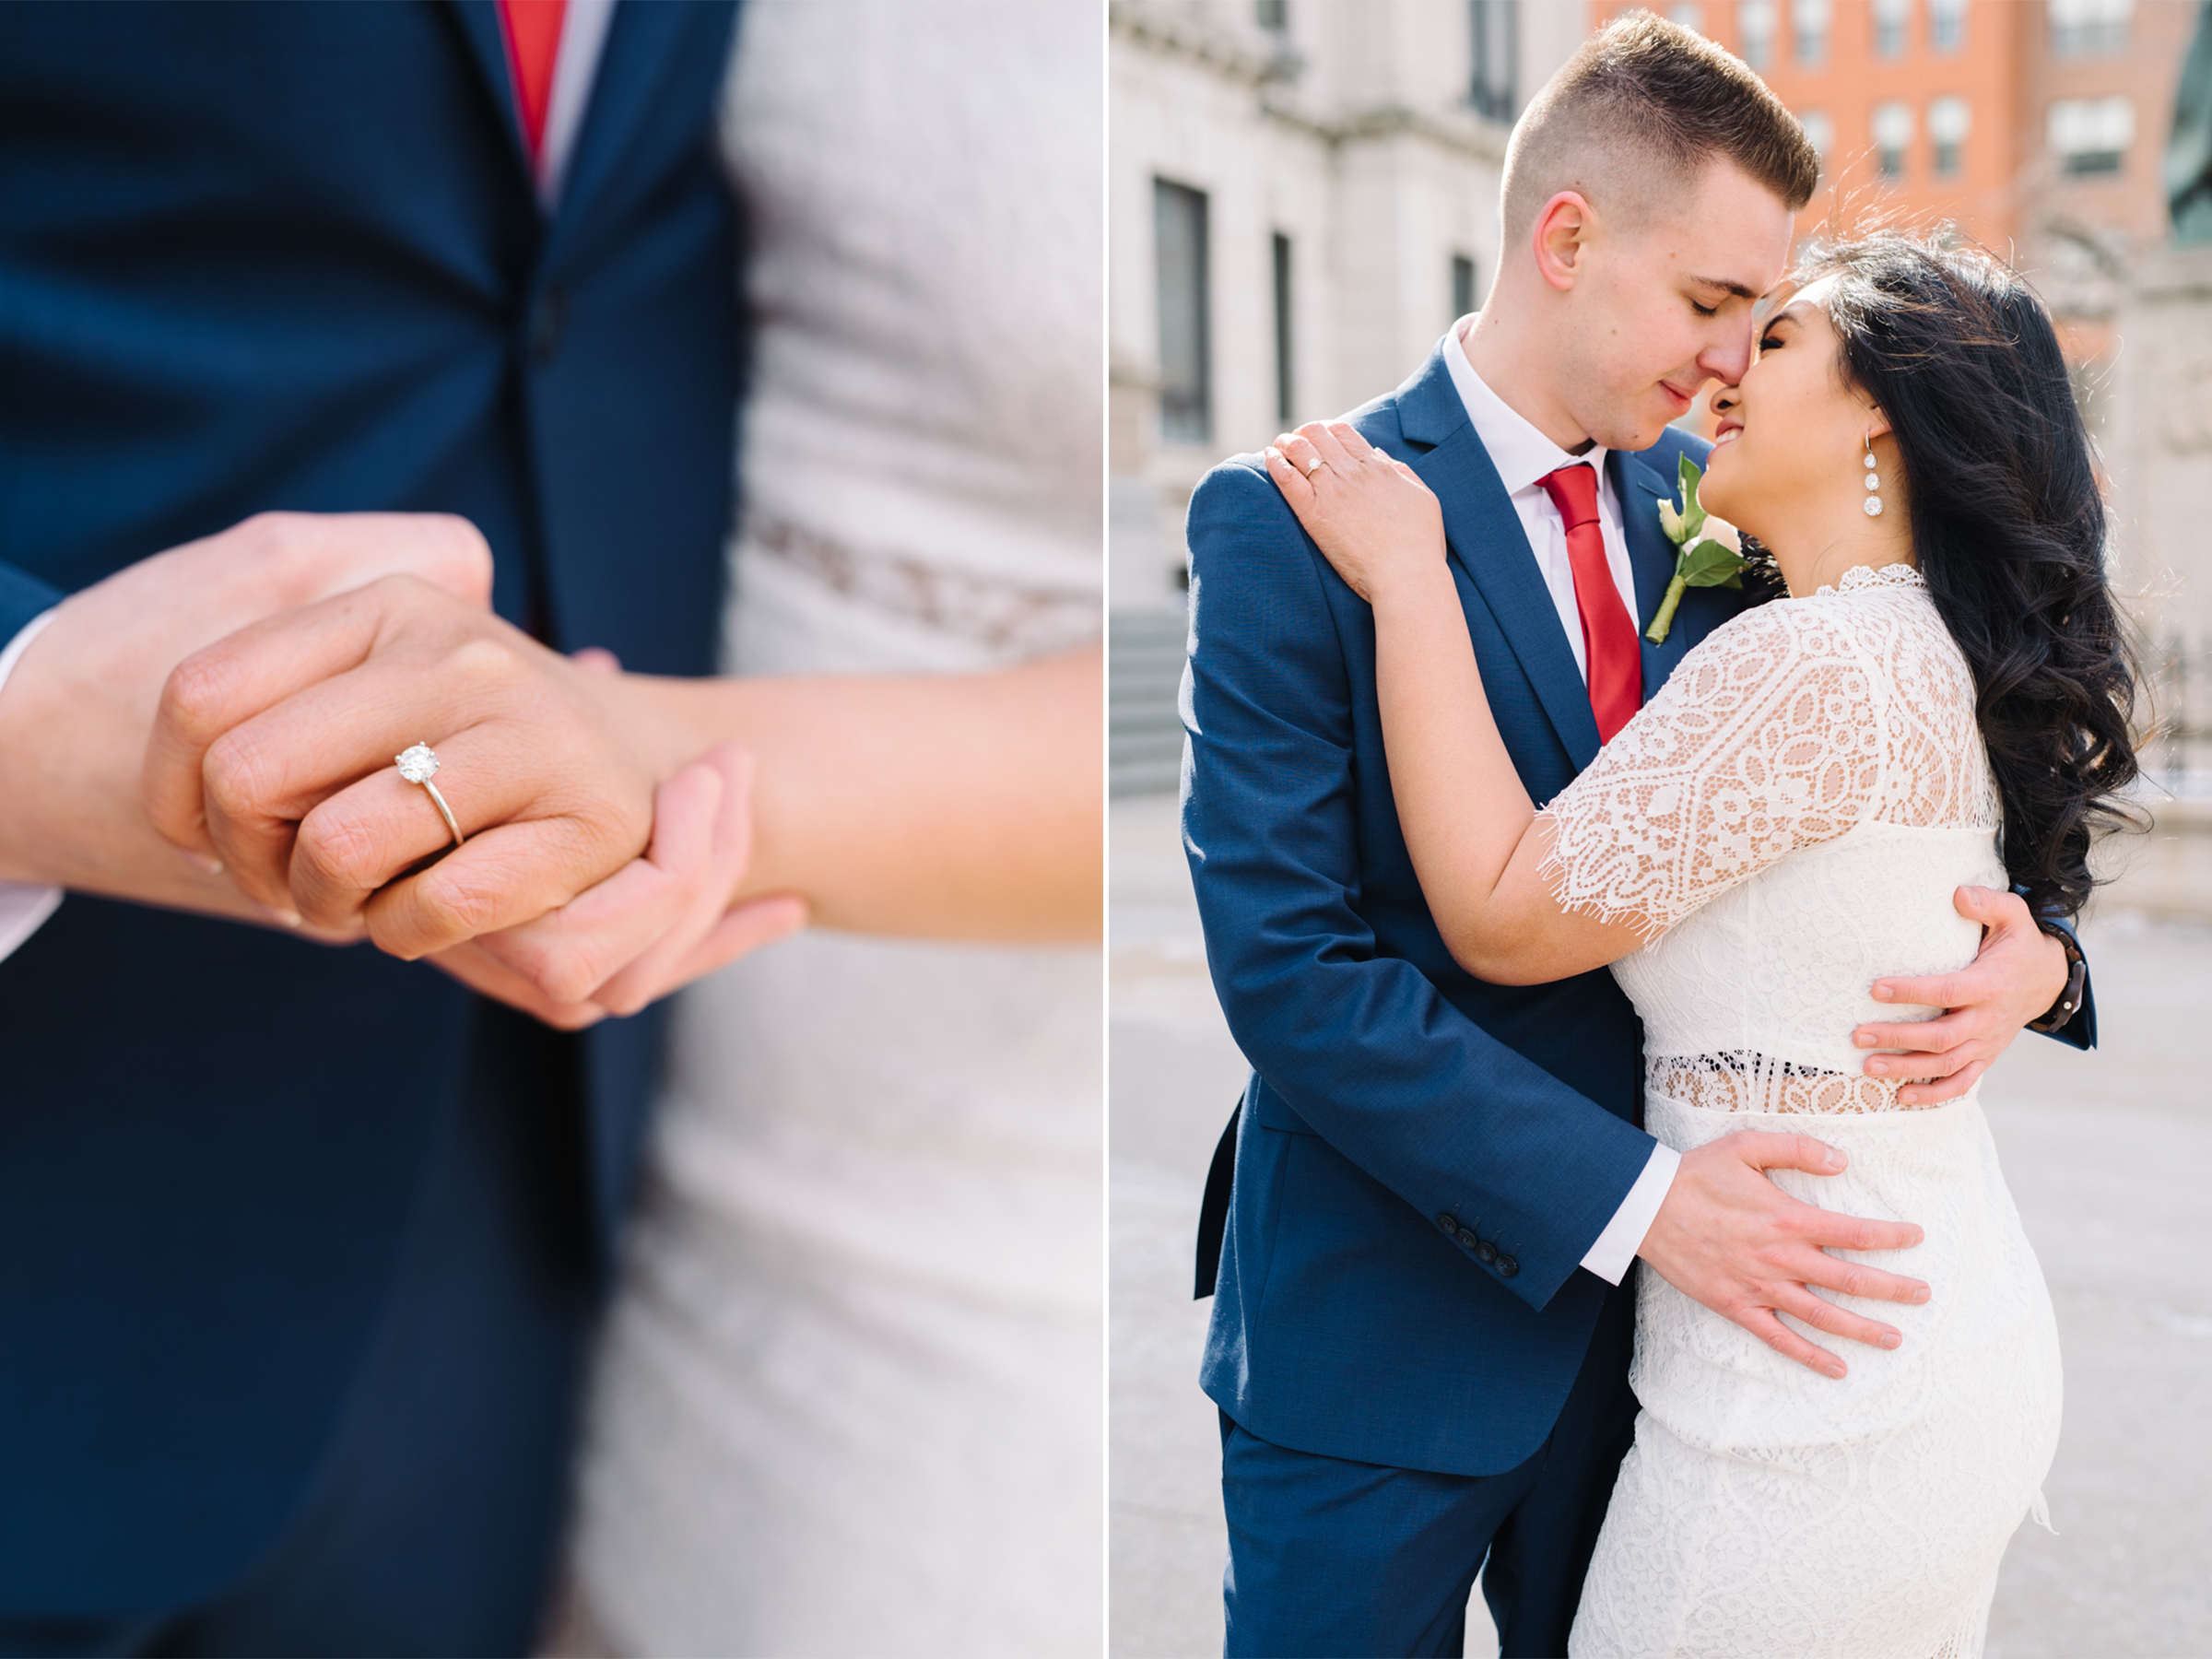 City Hall Wedding- Nichole + Lukasz- Jersey City New Jersey- Olivia Christina Photo.3.jpg